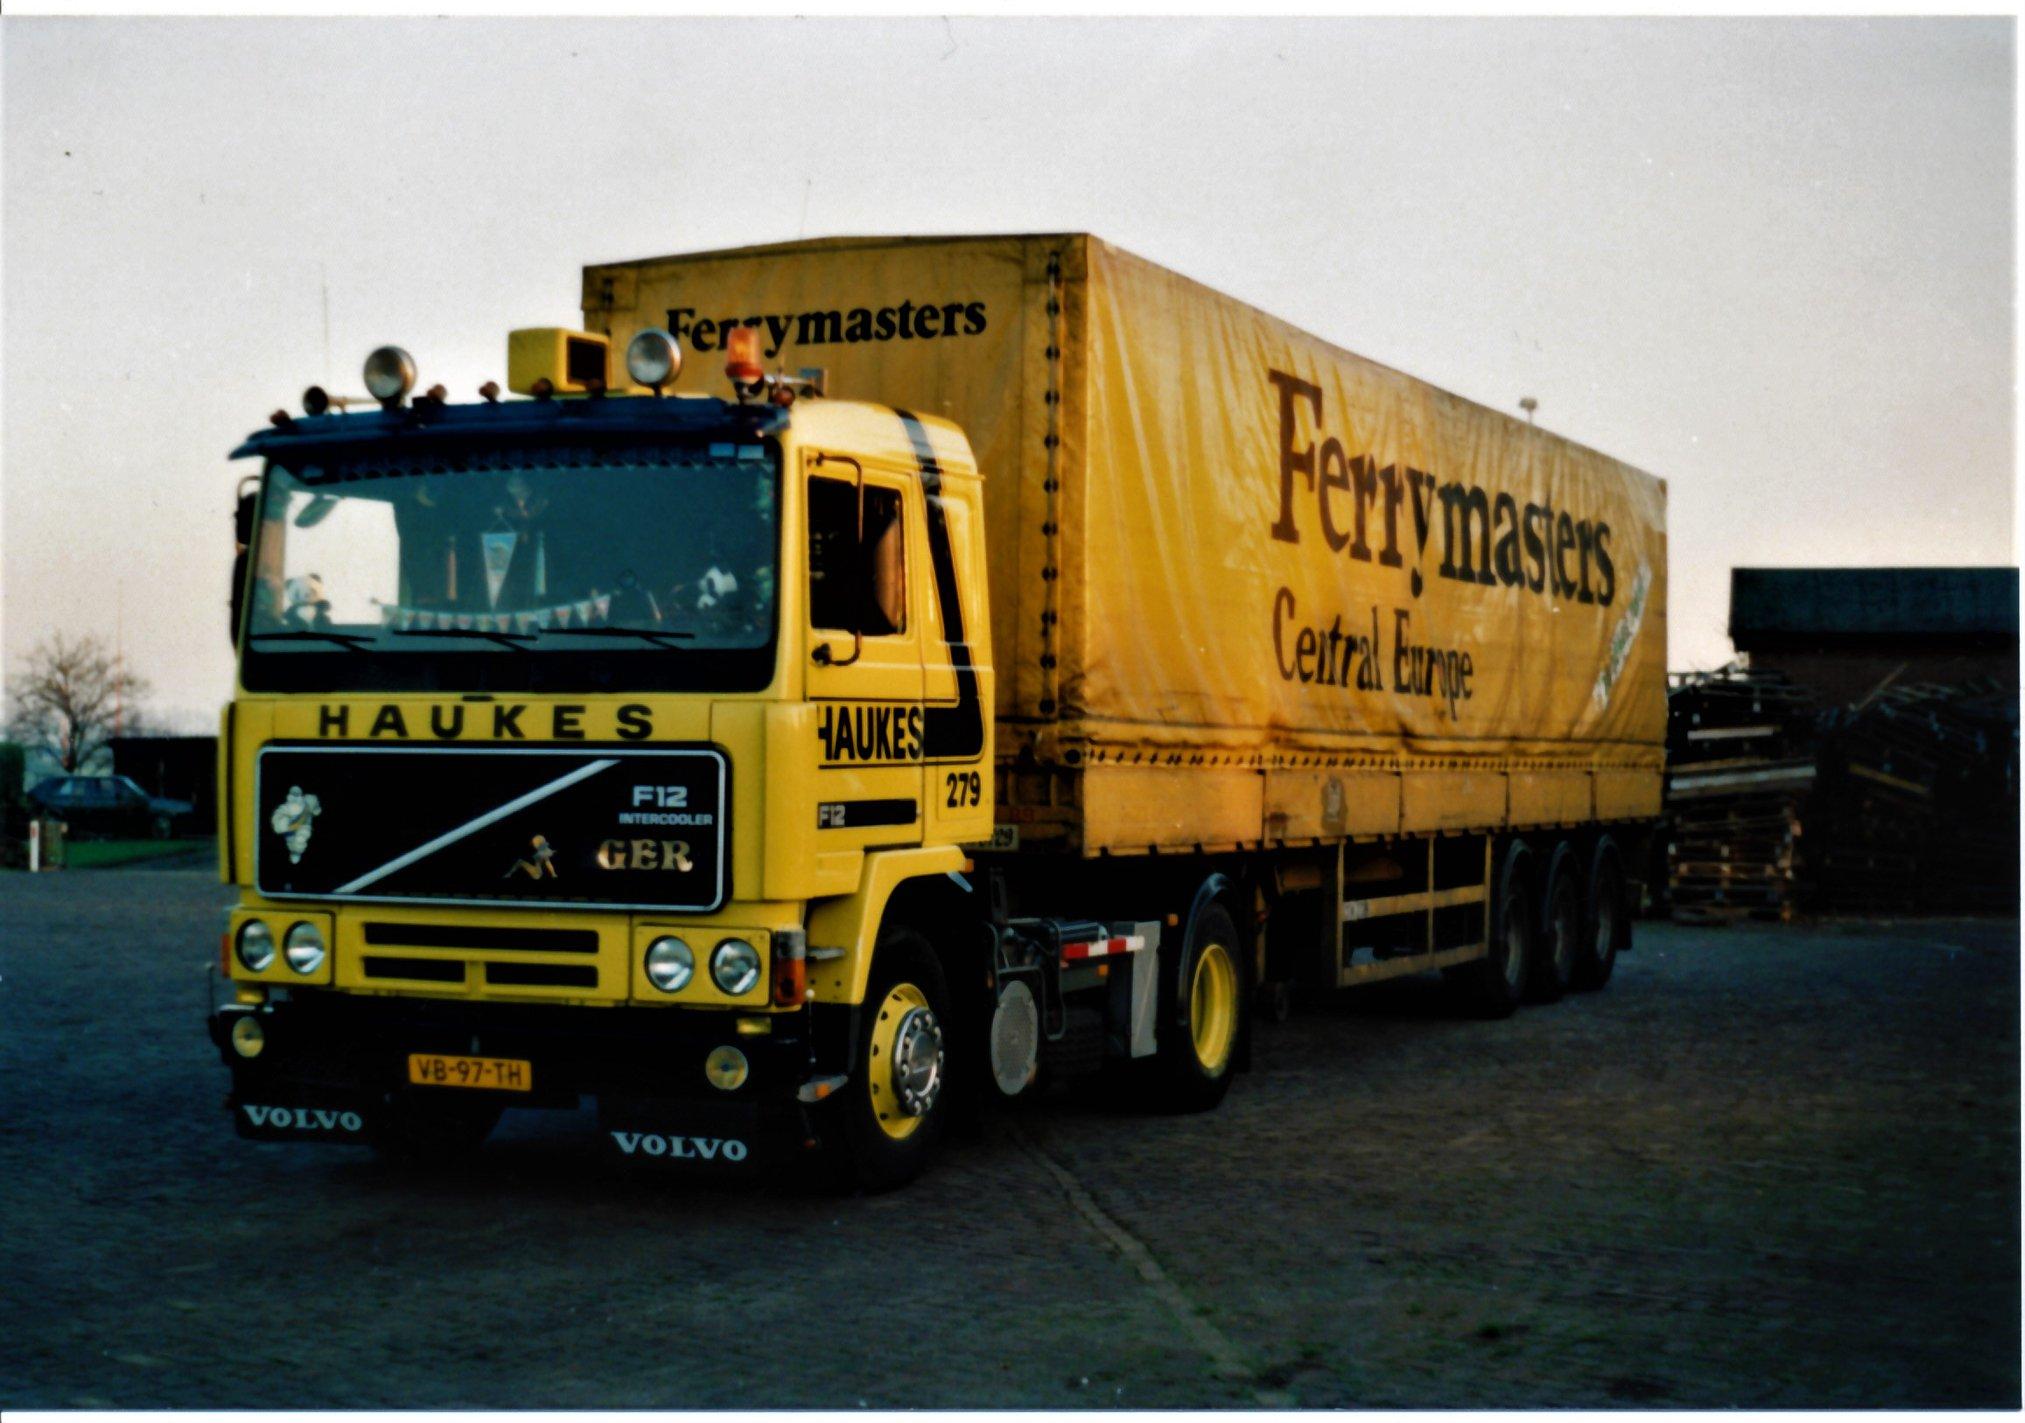 Volvo-279-Han-Megens--met-Ferry-Master-oplegger